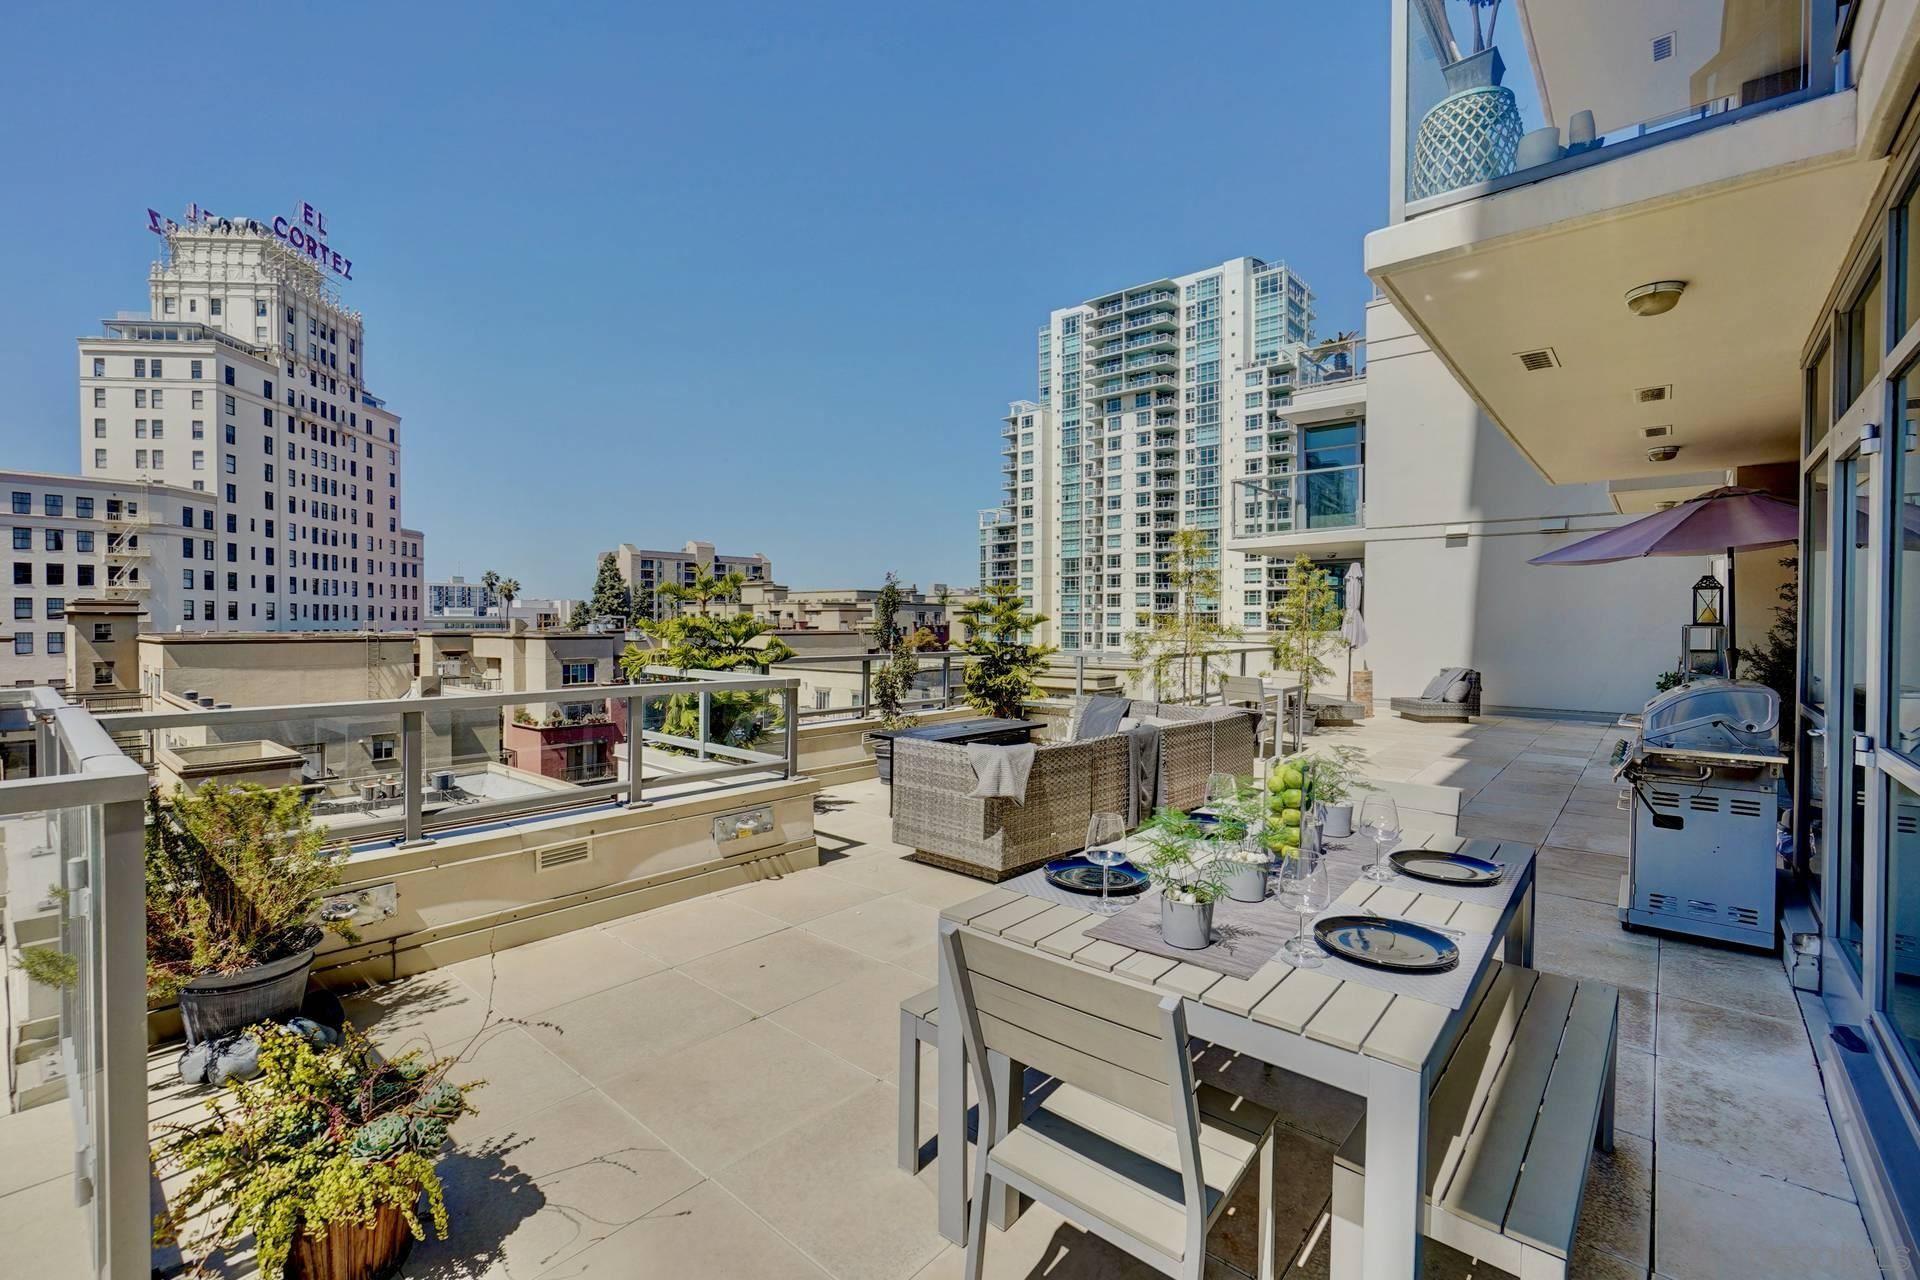 Photo for 1441 9th Avenue #803, San Diego, CA 92101 (MLS # 210008370)